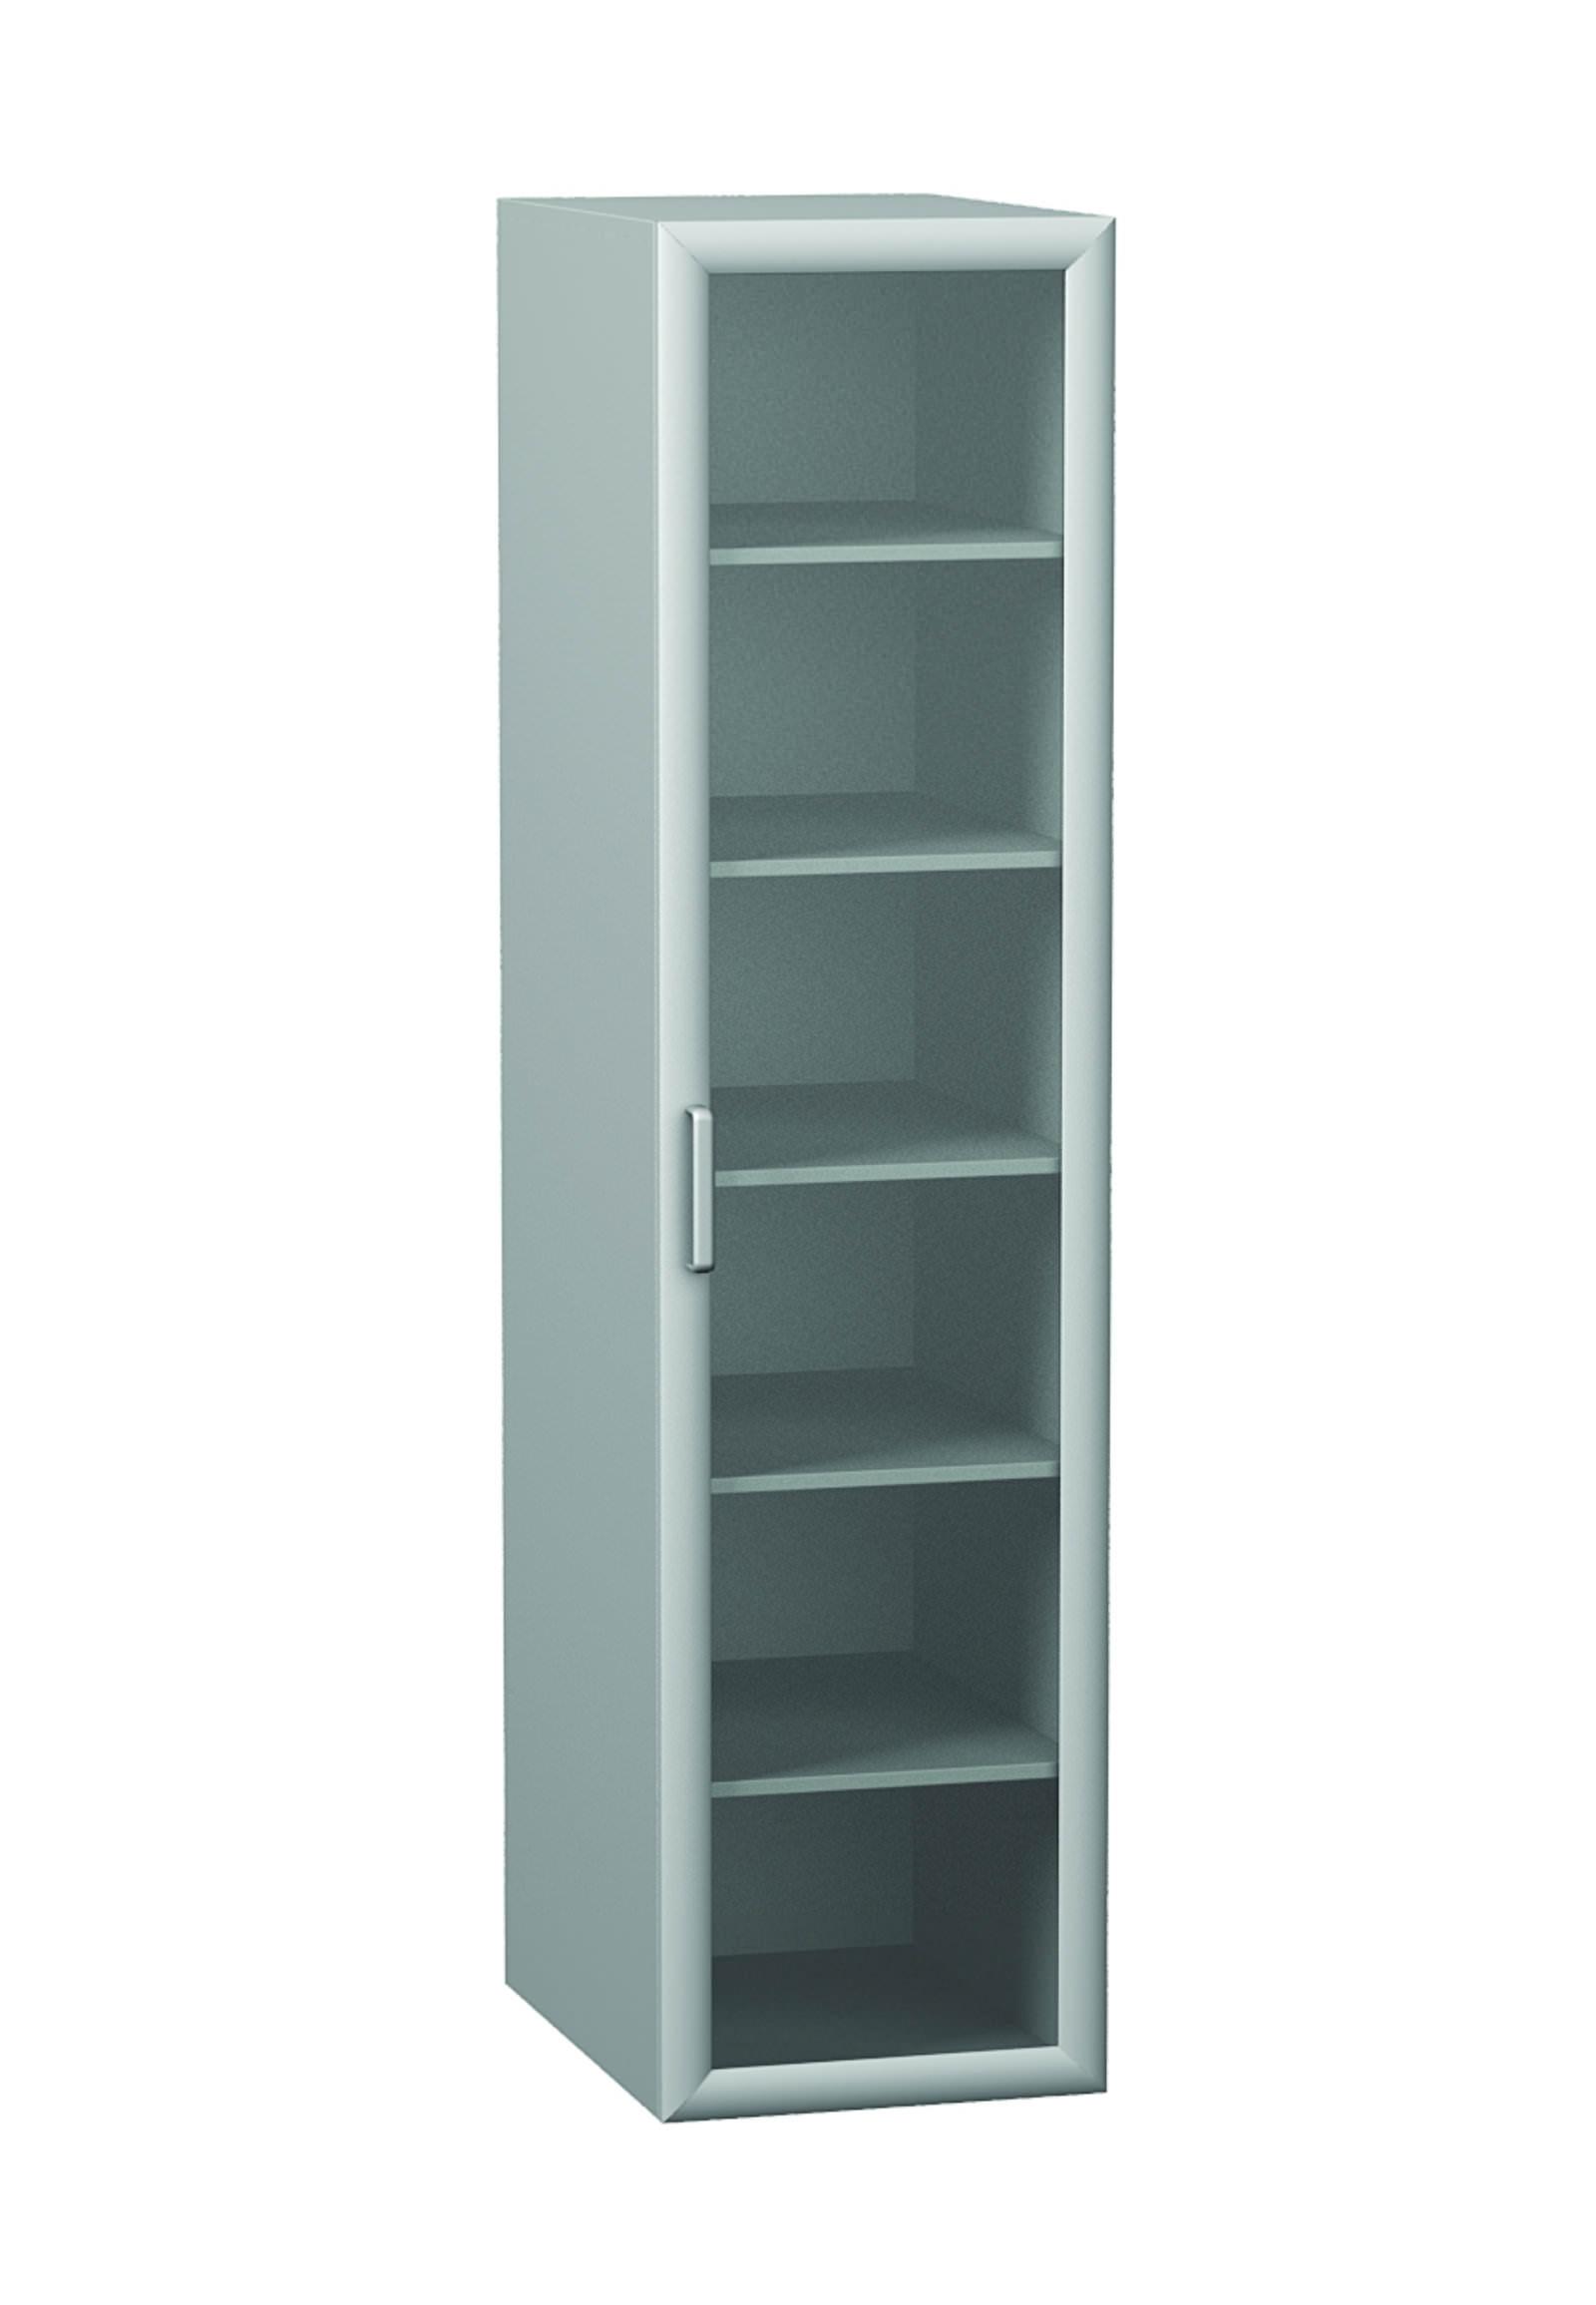 Медицинский шкаф ДМ-4-001-01